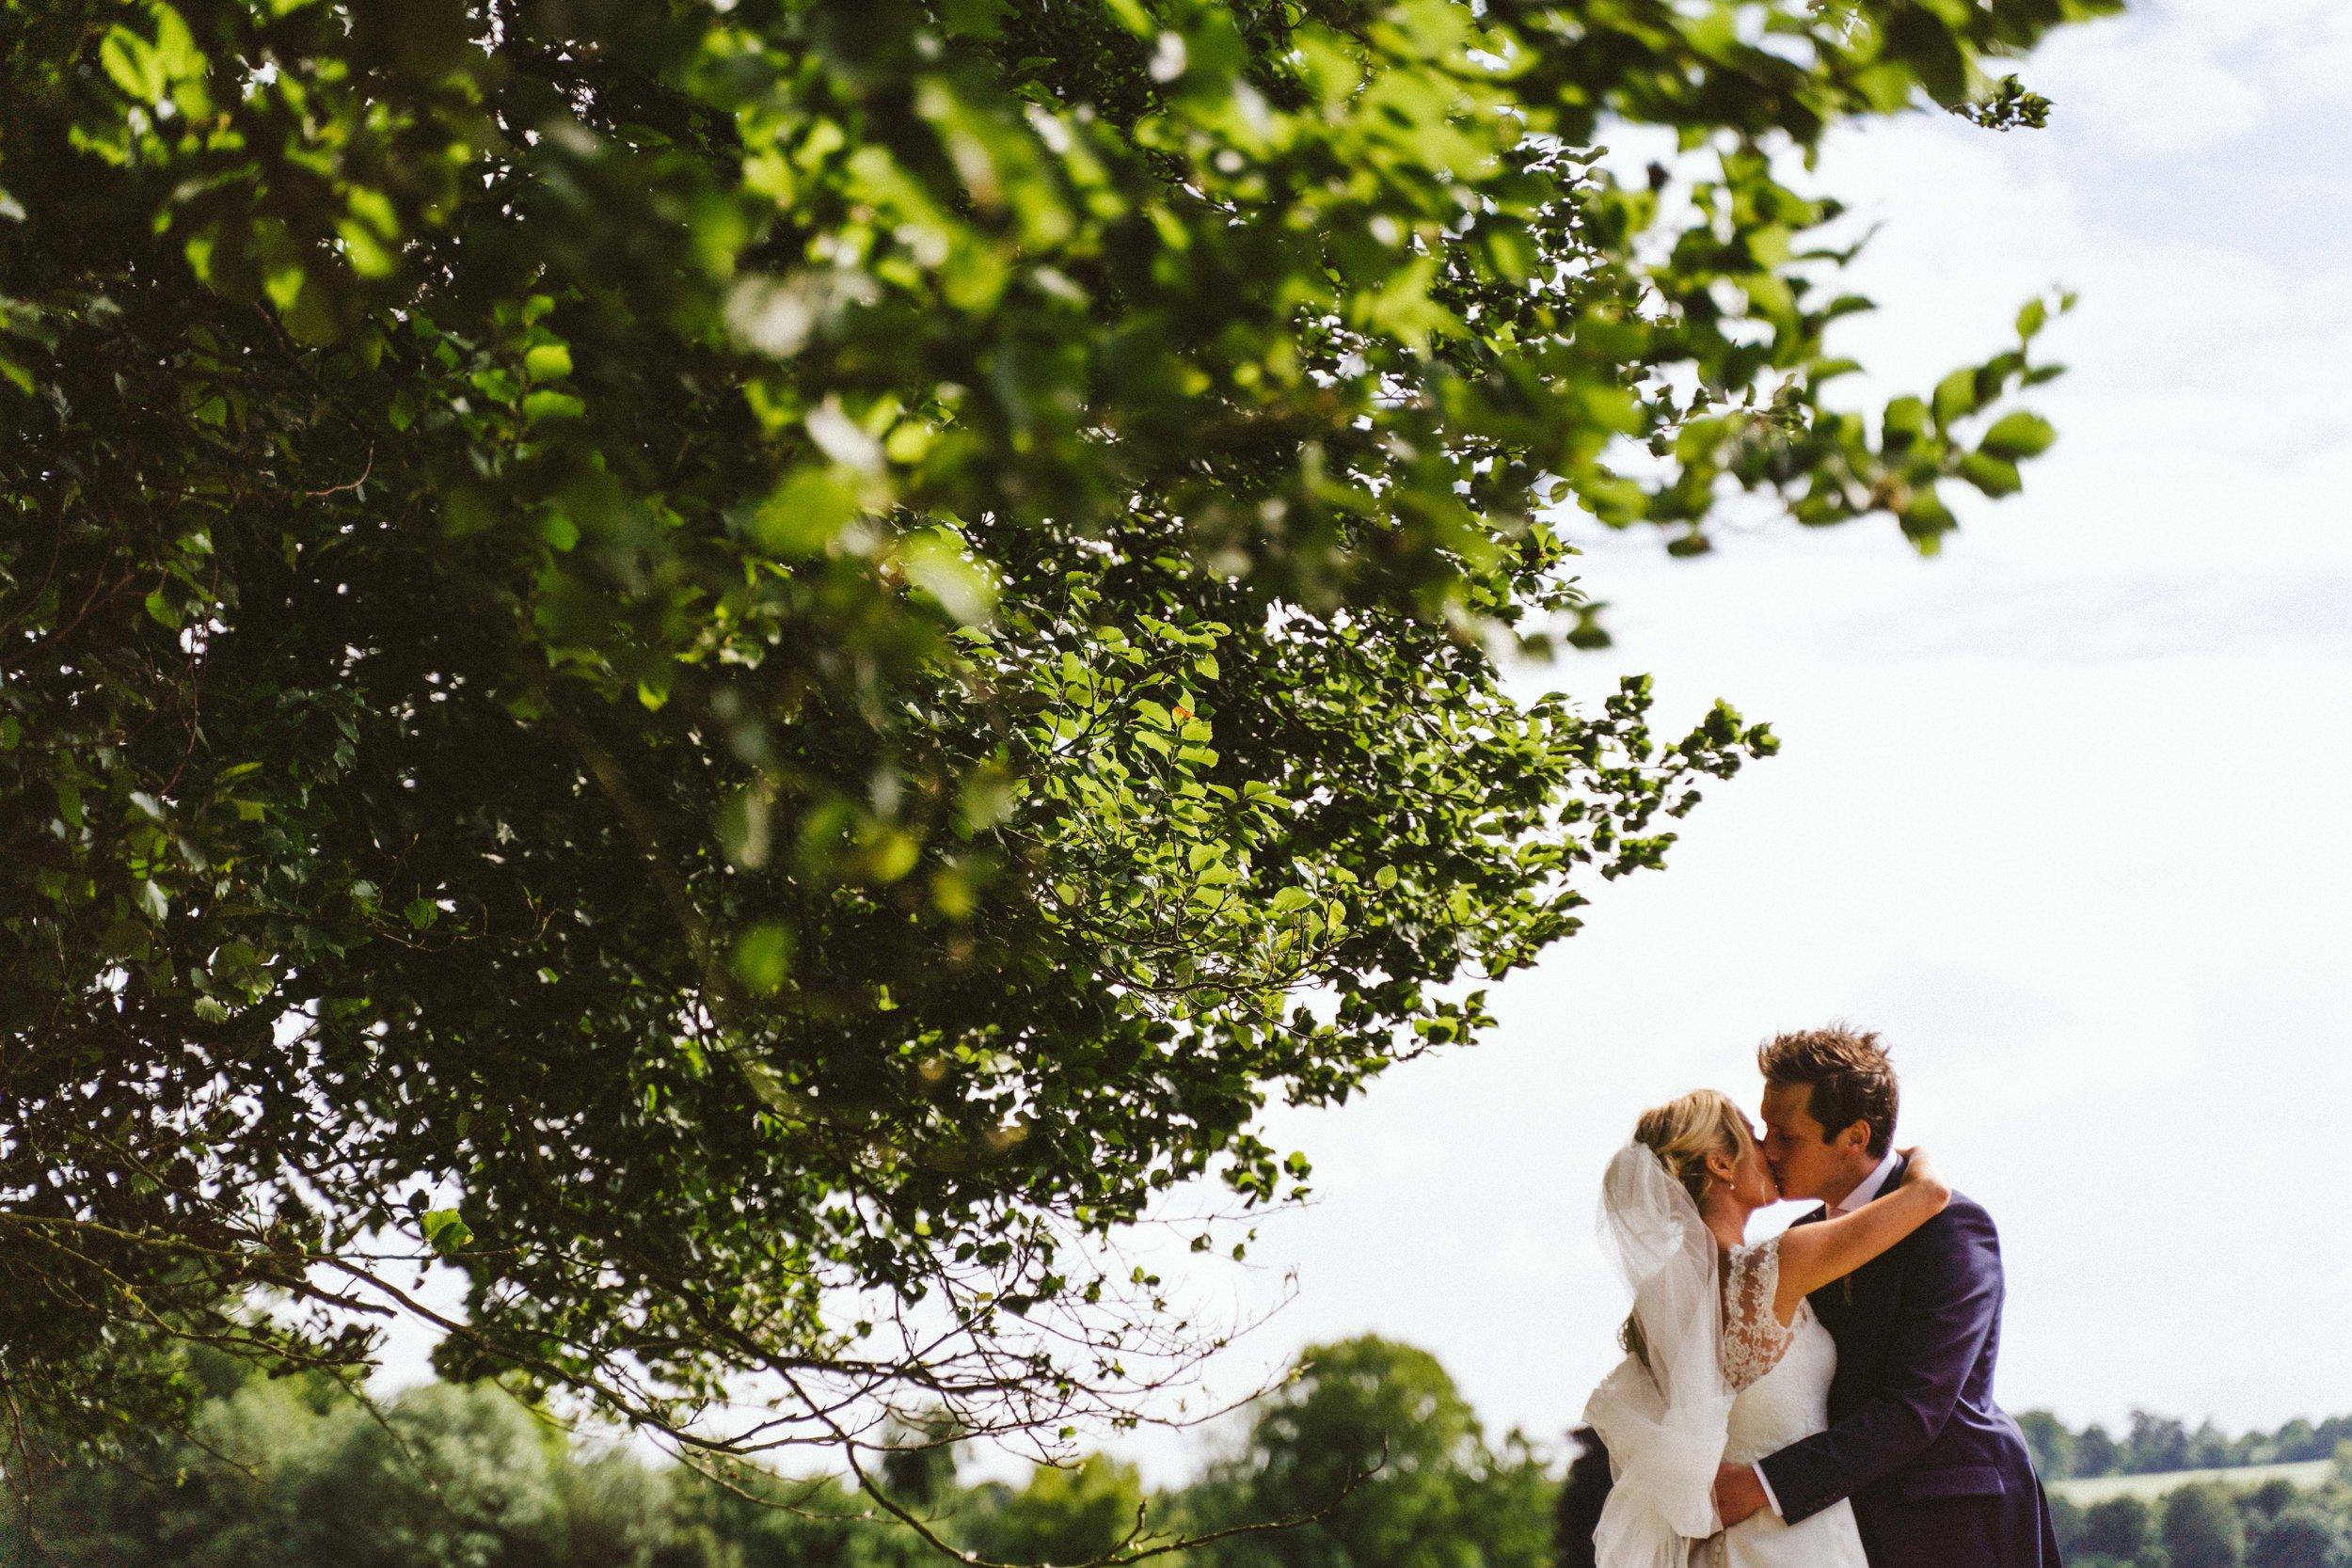 kent-wedding-photographer-102291.jpg